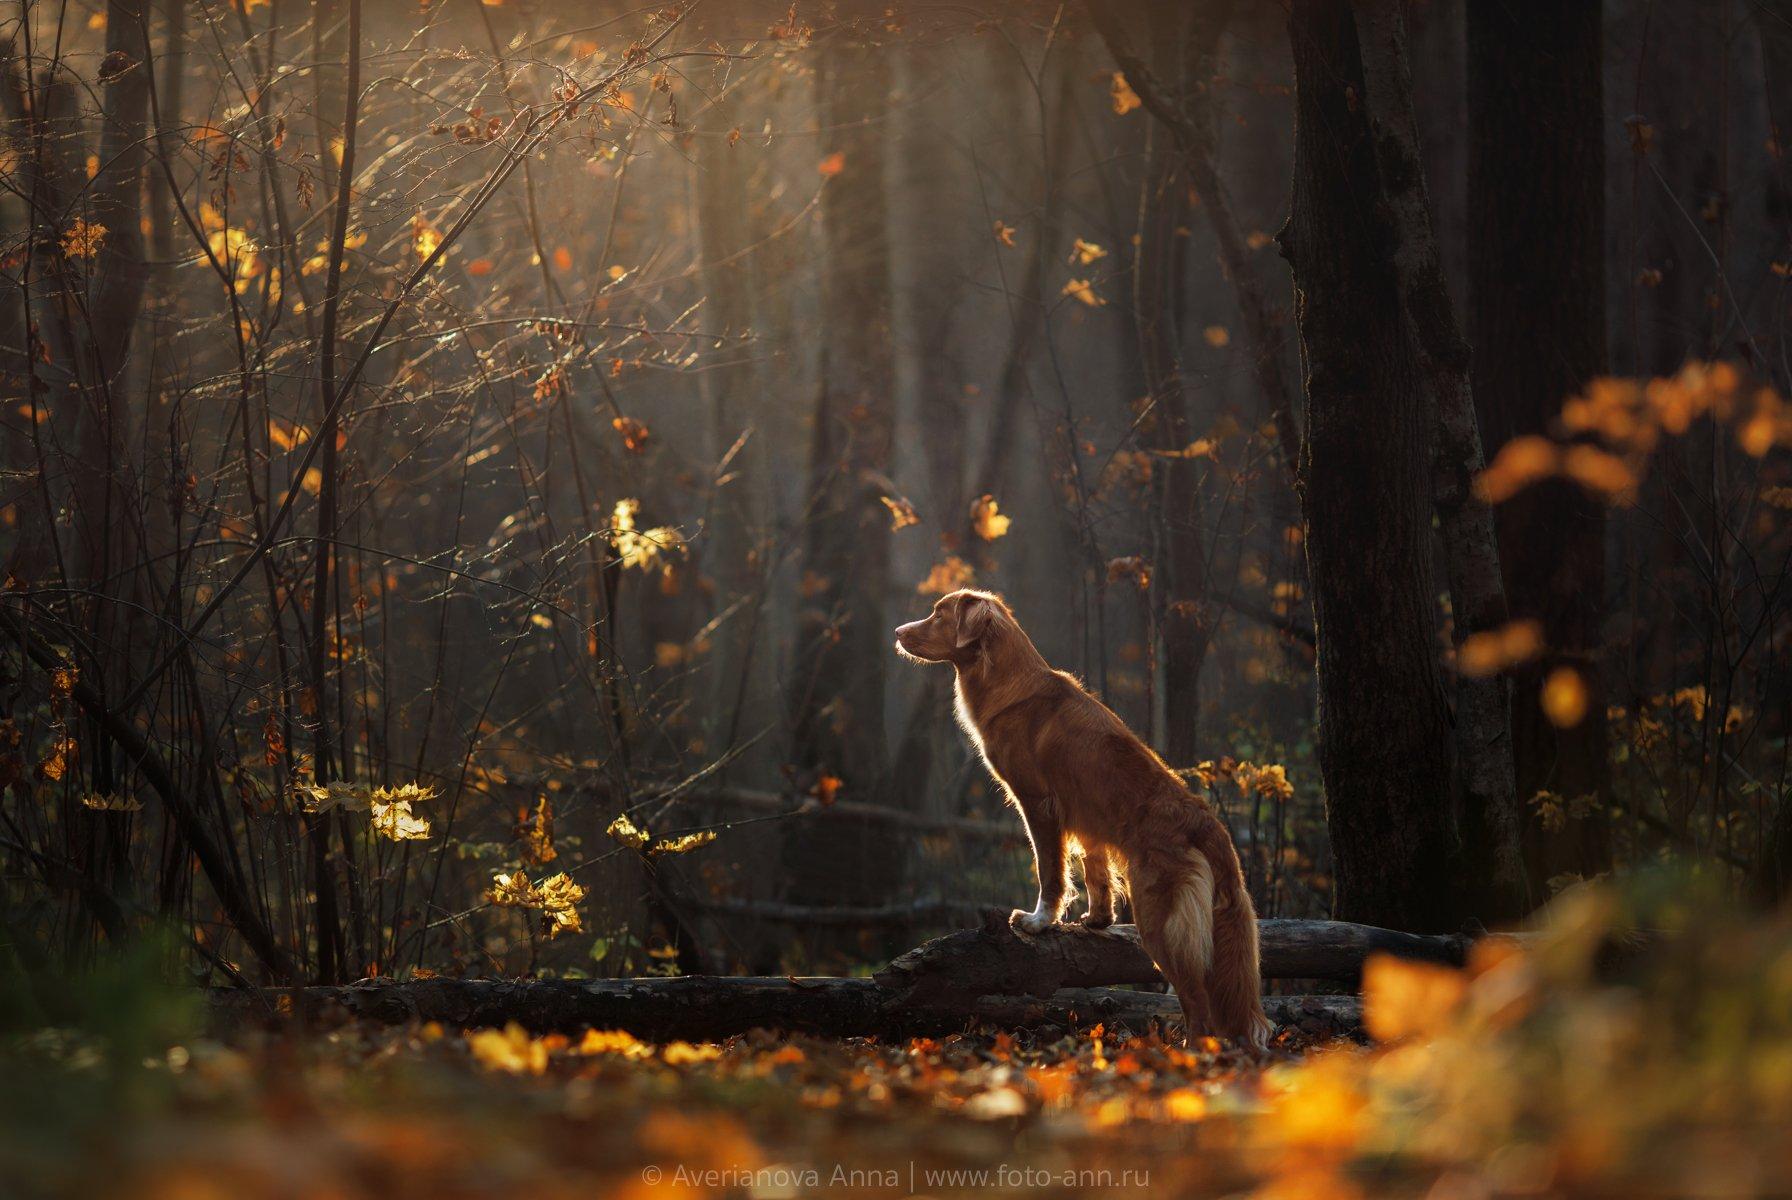 собака, природа, Анна Аверьянова